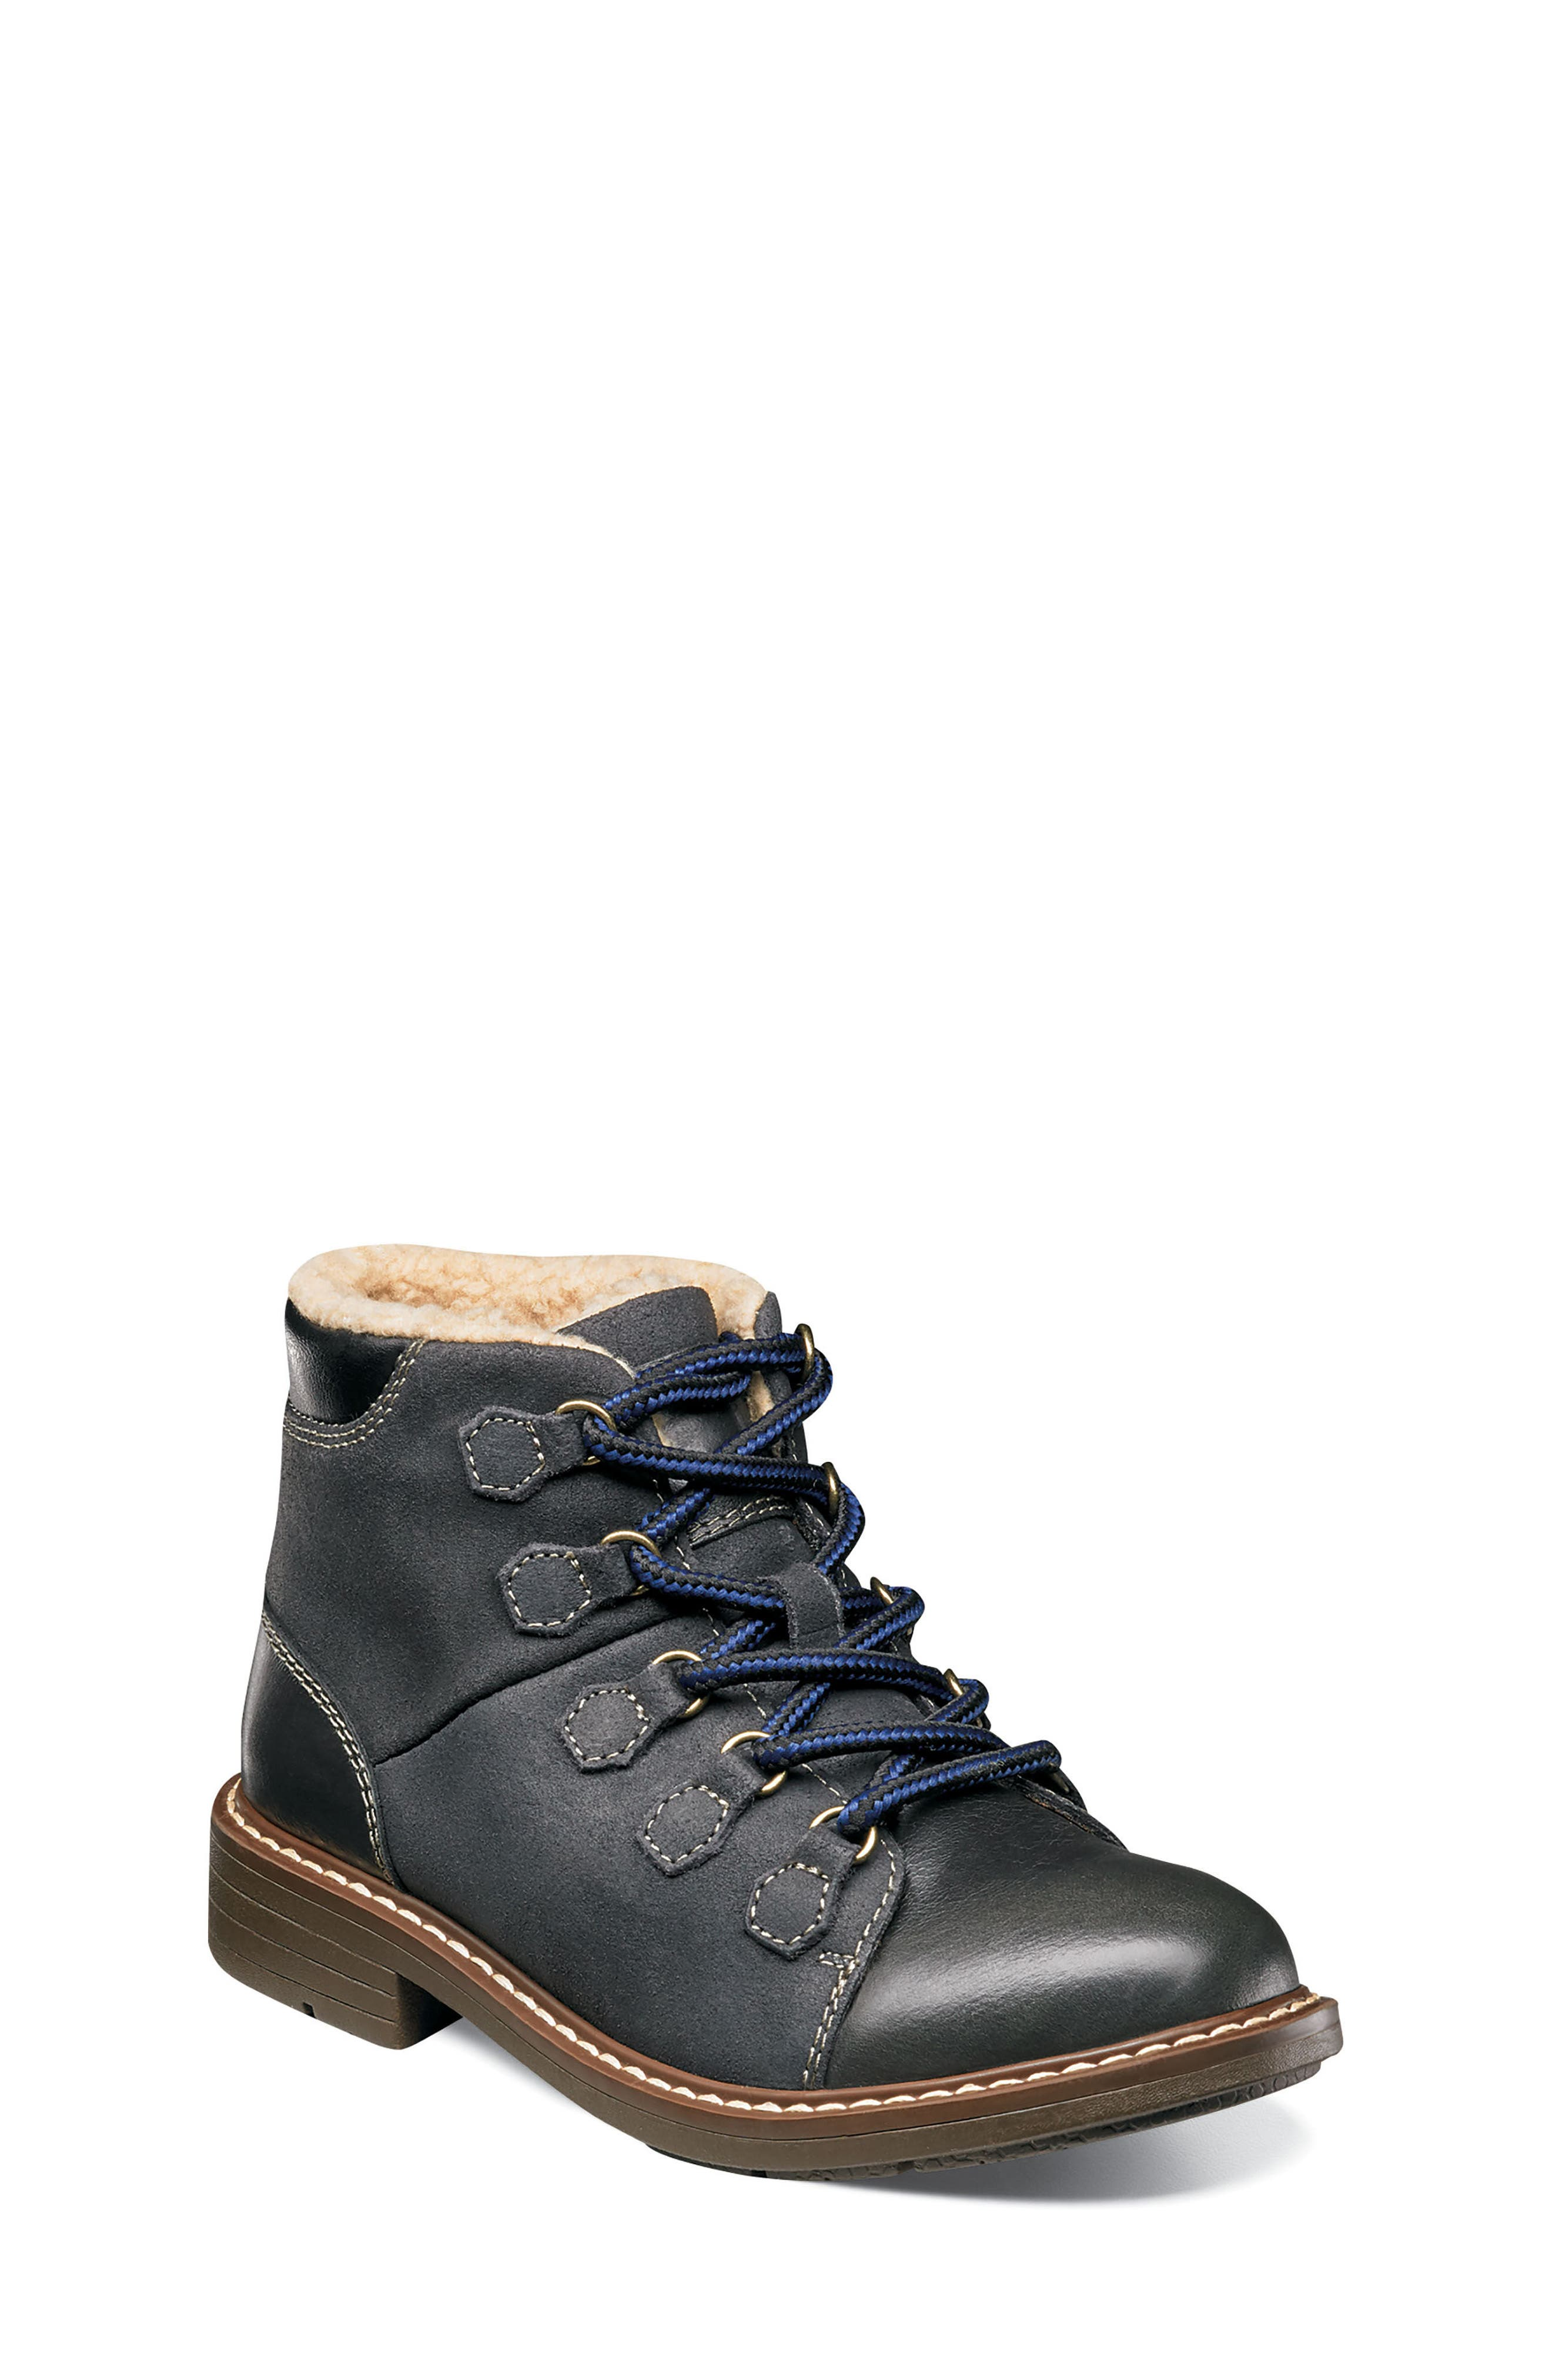 Studio Alpine Plush Lined Boot,                         Main,                         color, 020